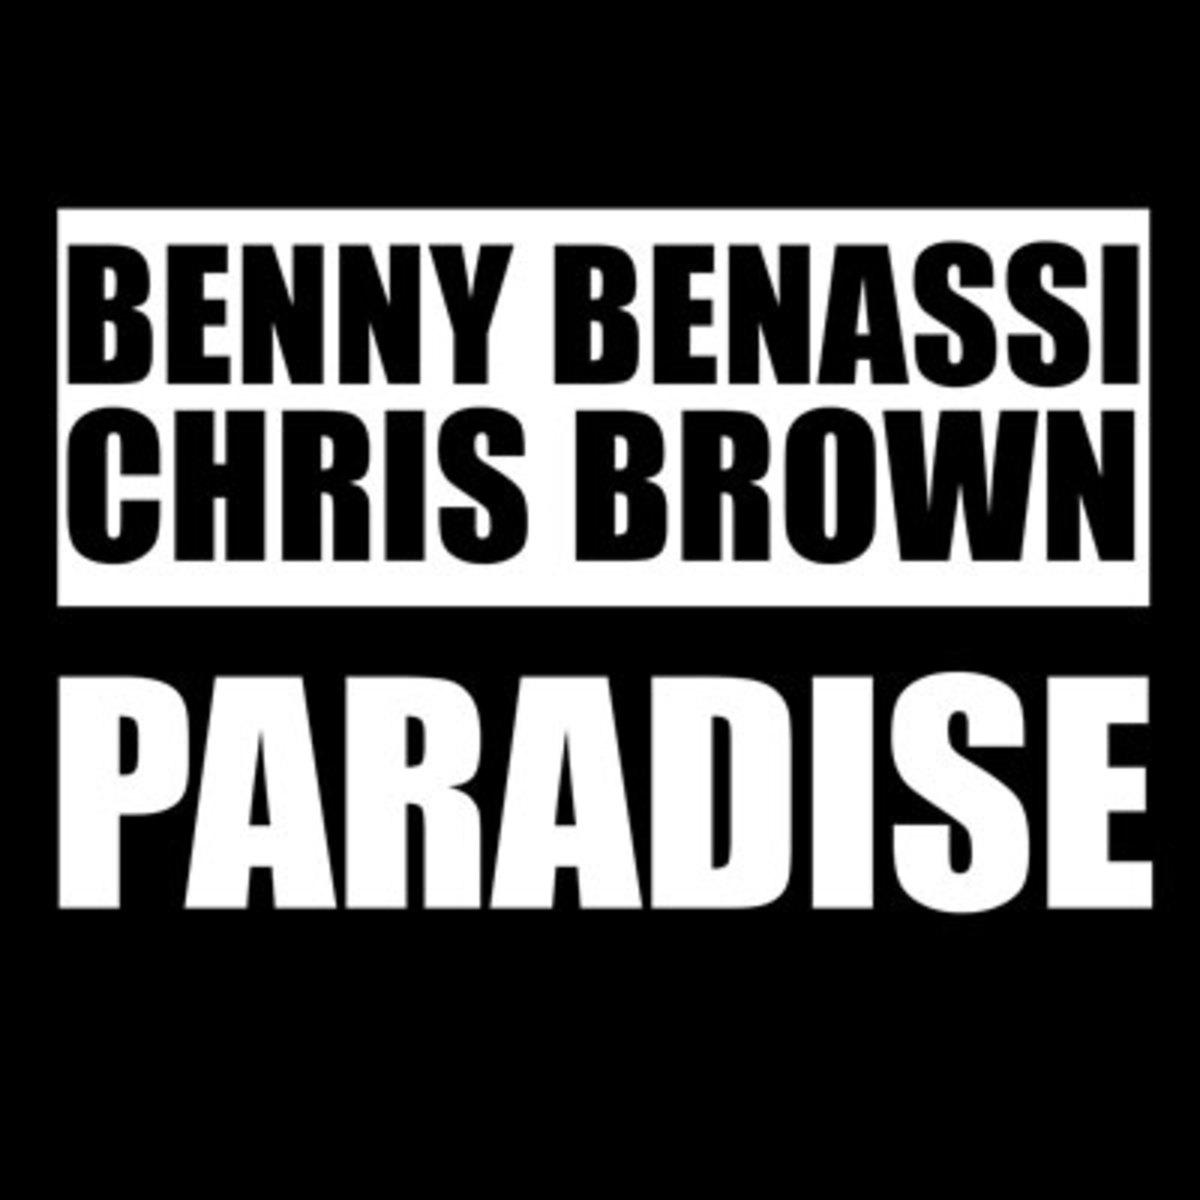 benny-benassi-paradise.jpg